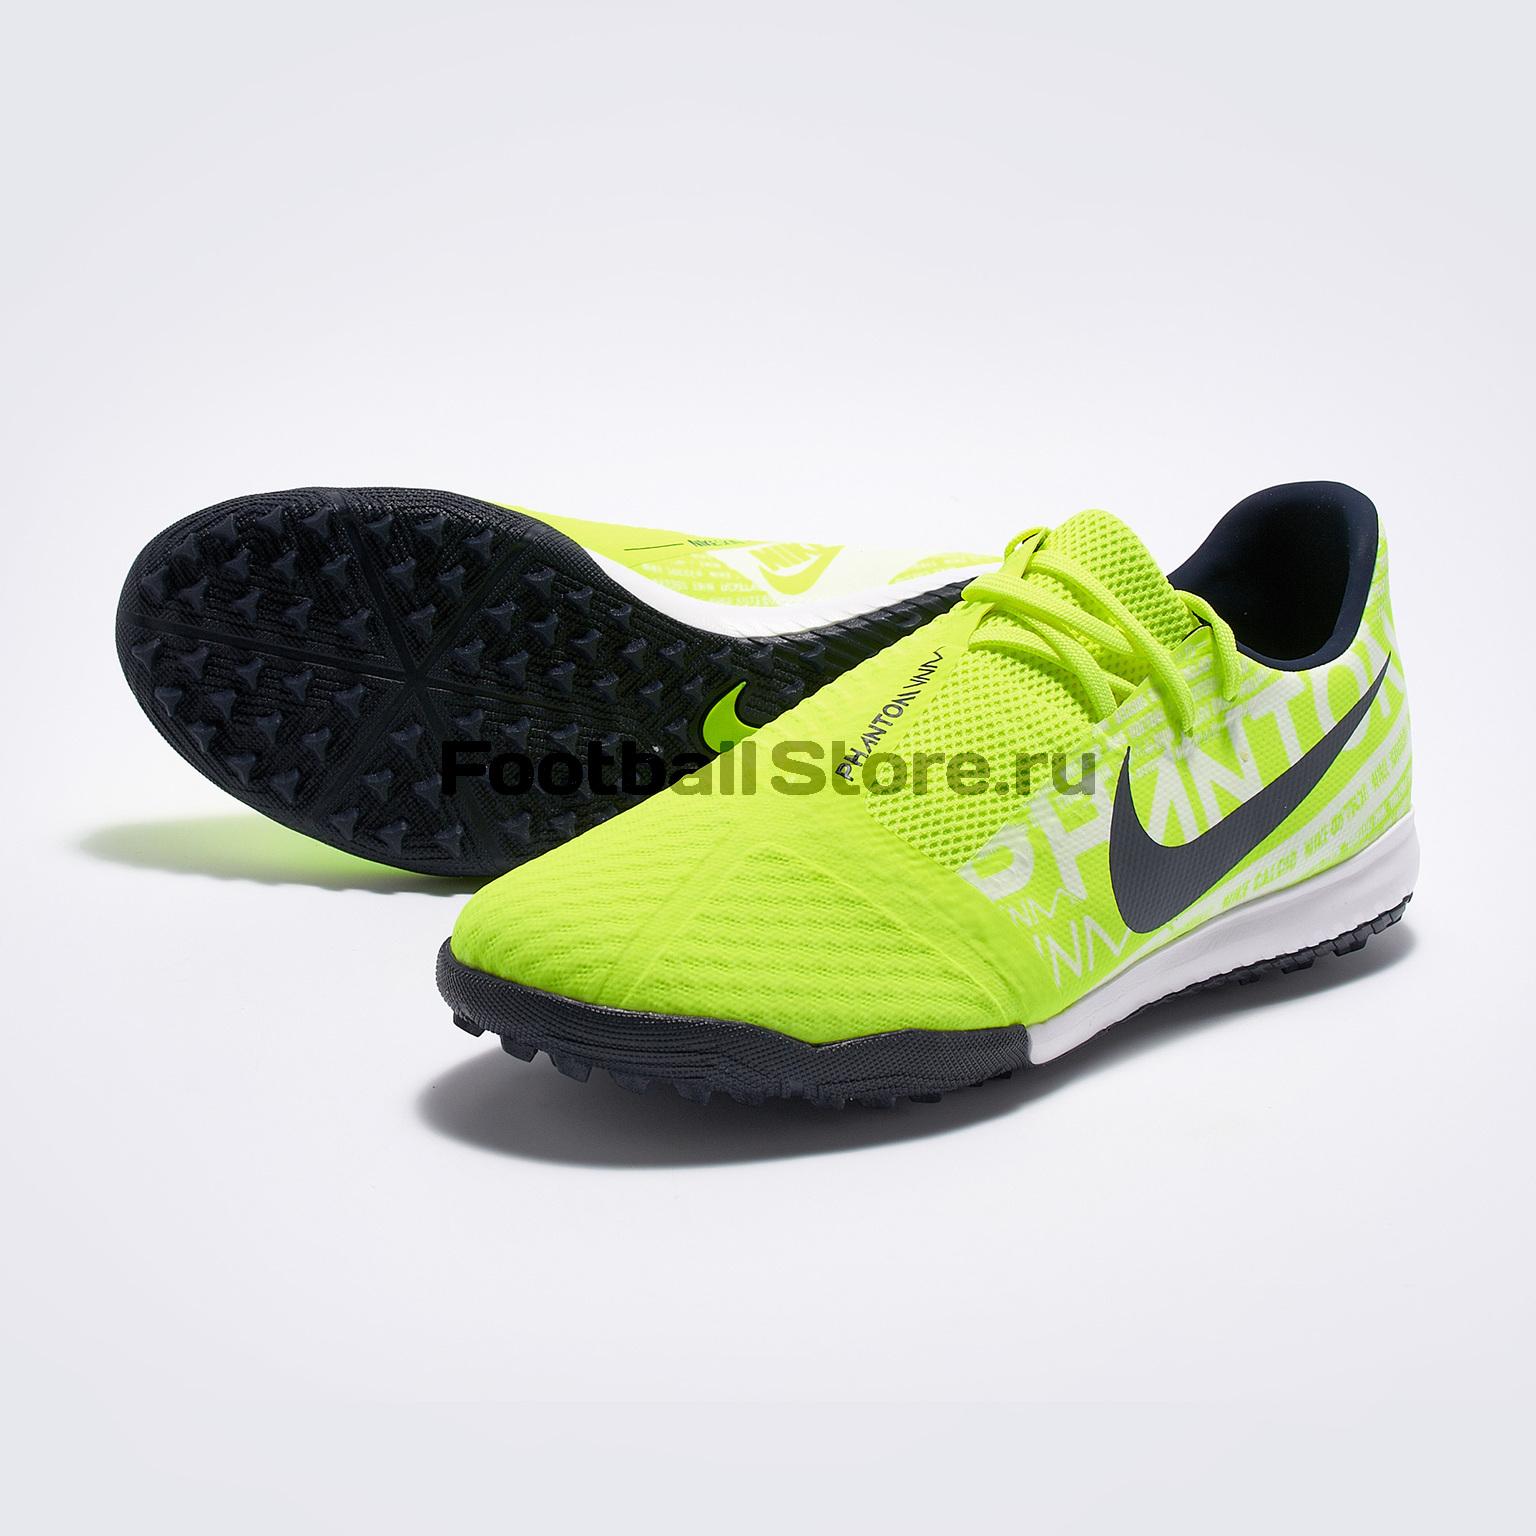 Шиповки Nike Phantom Venom Academy TF AO0571-717 цена